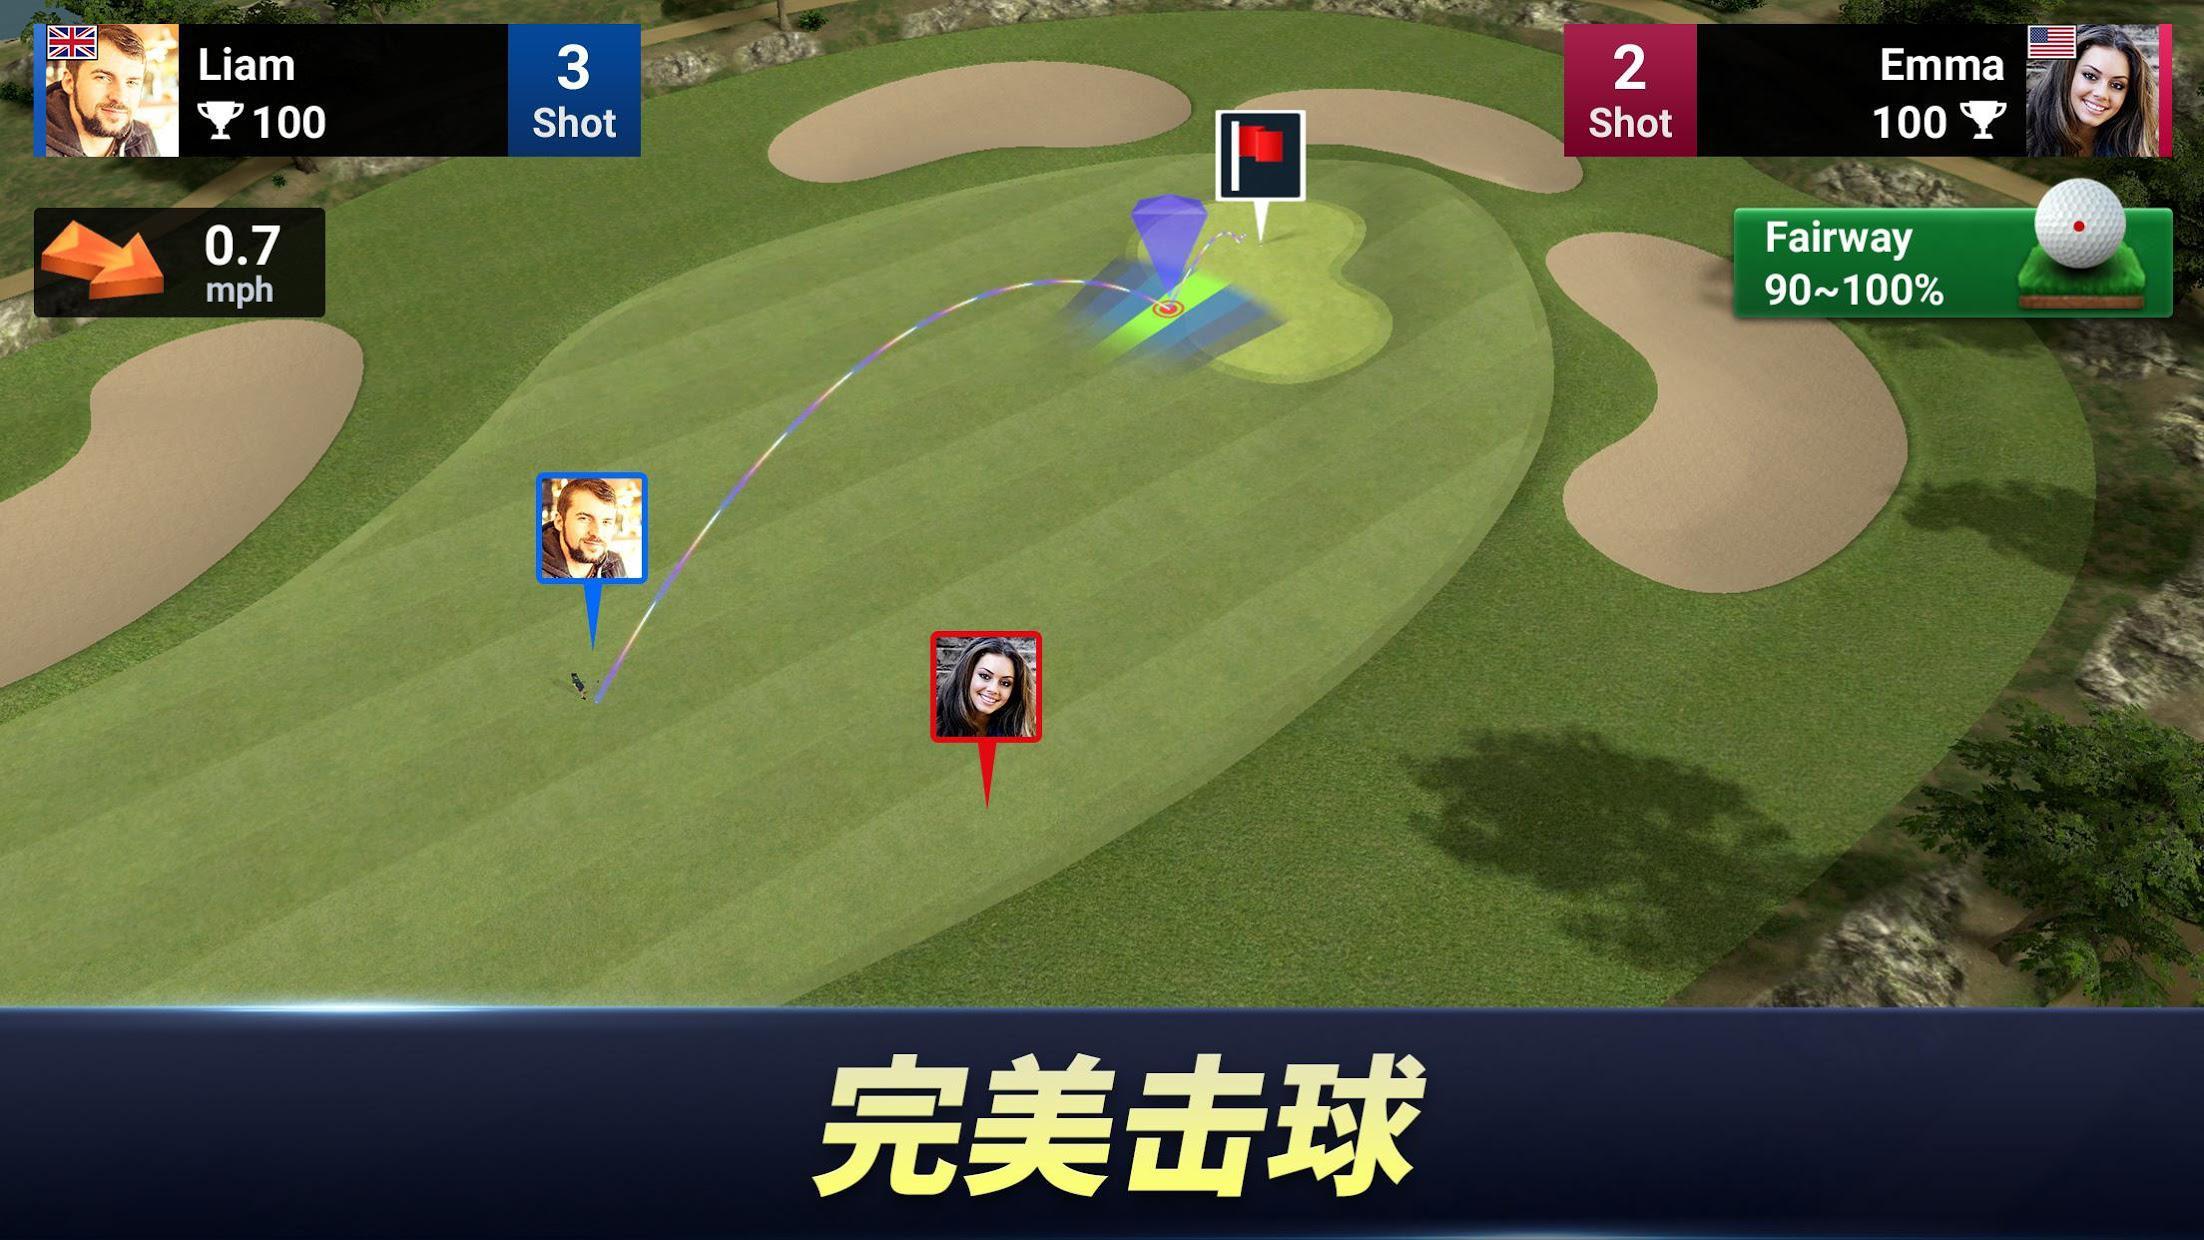 Golf King - 世界巡回赛 游戏截图2